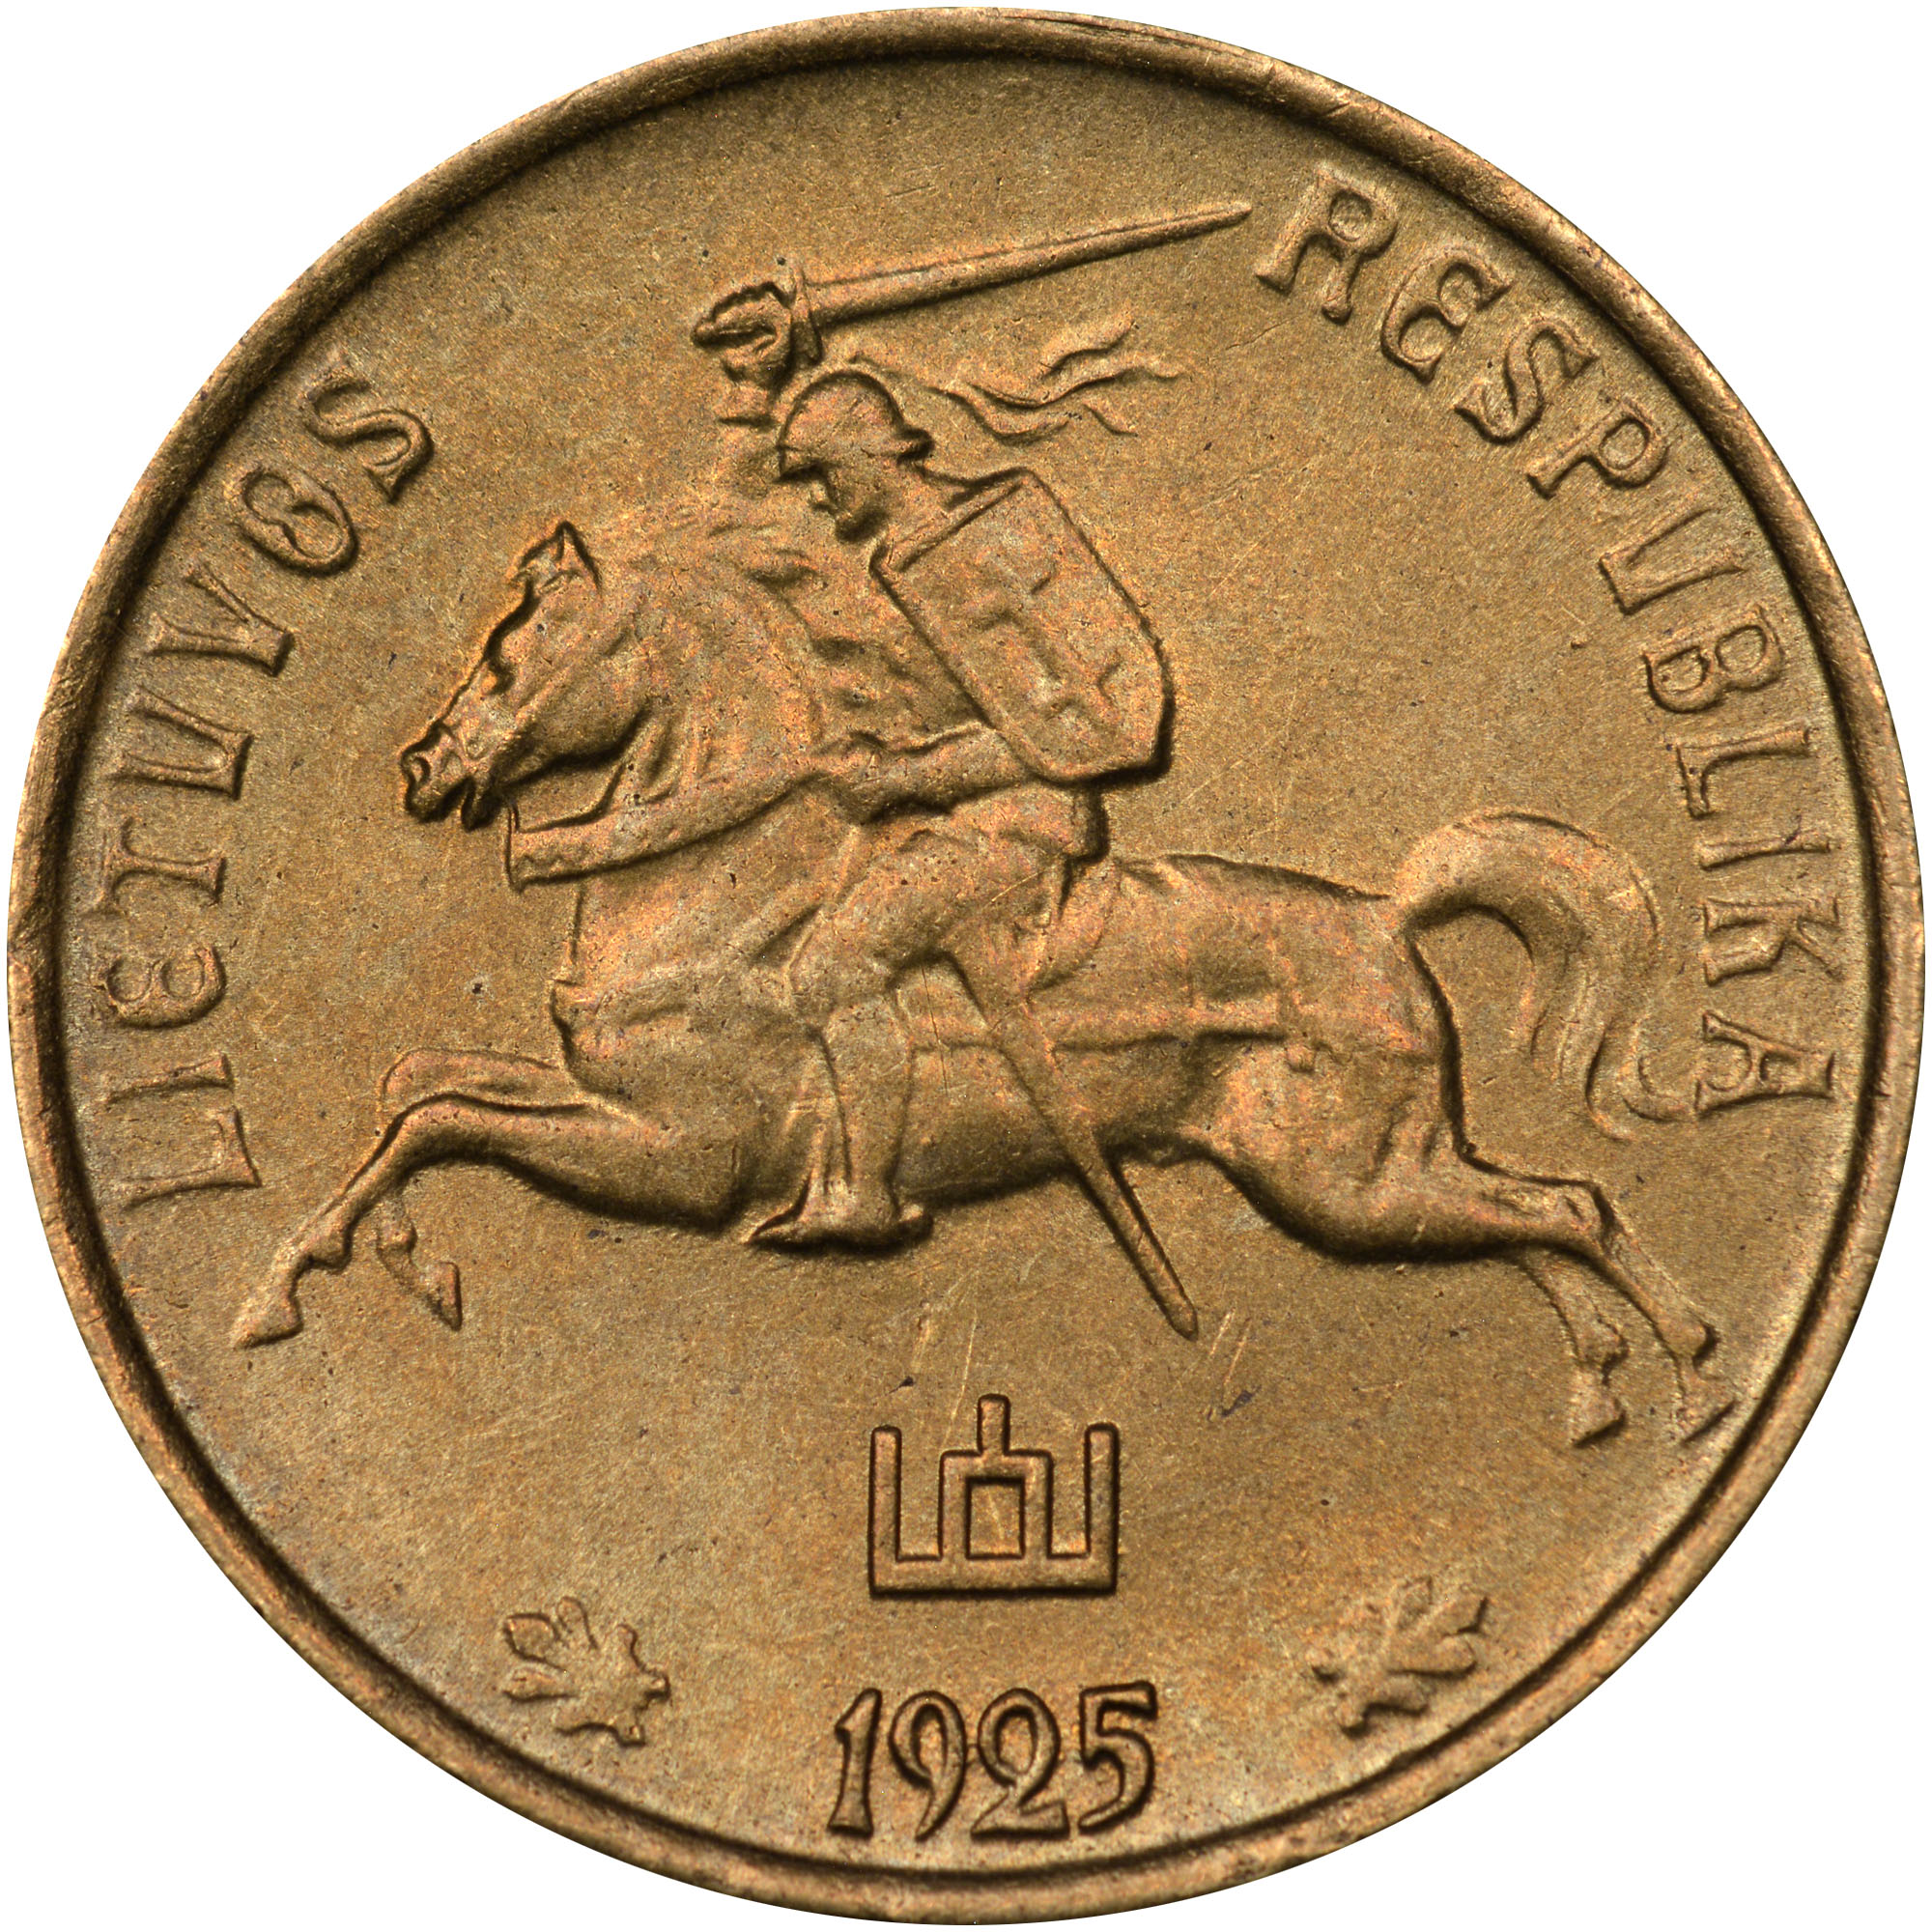 Lithuania Centas obverse